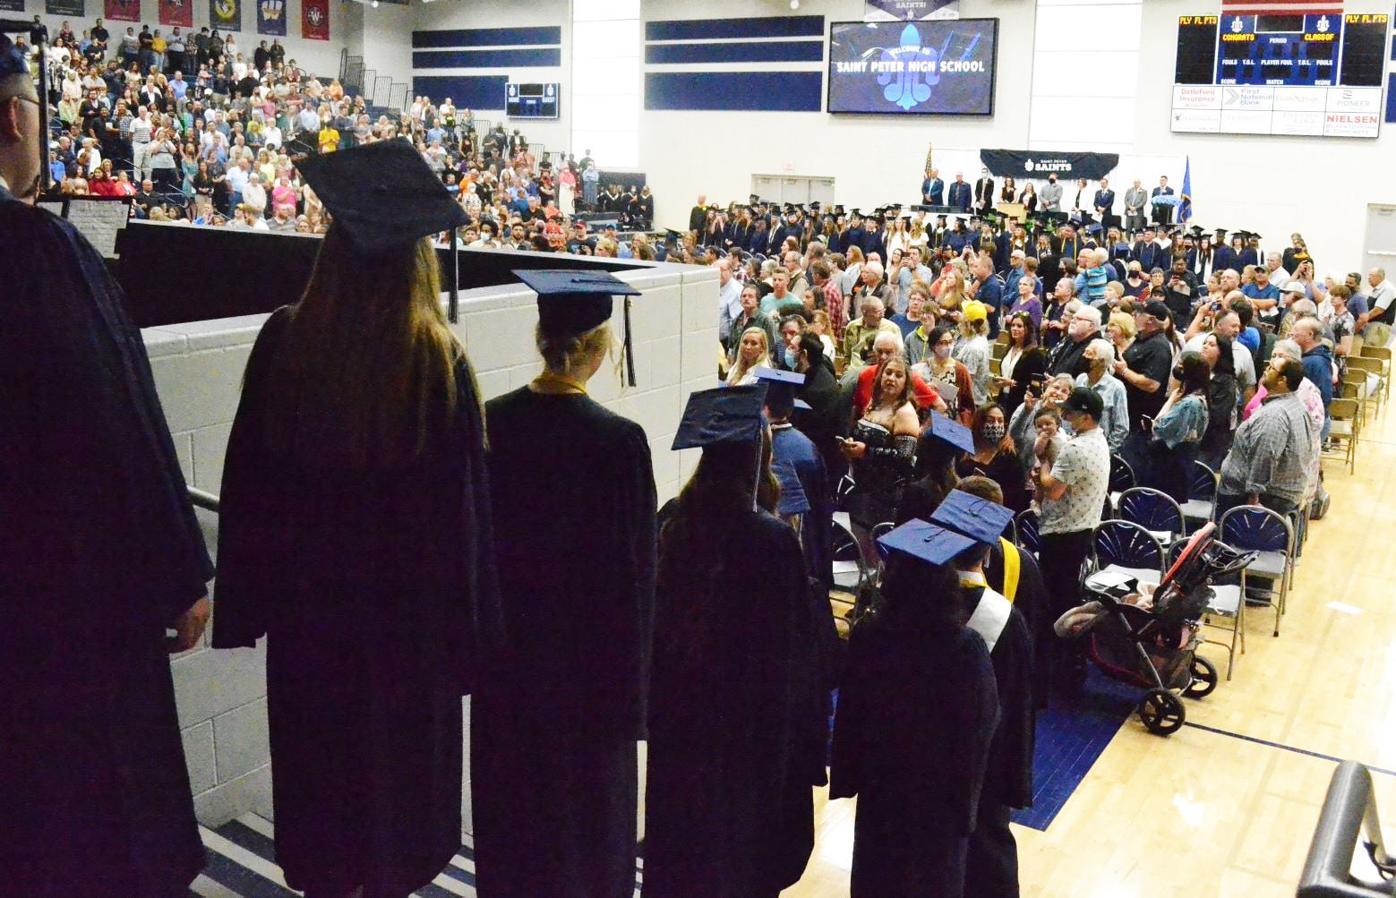 6.3 SPHS Graduation 1